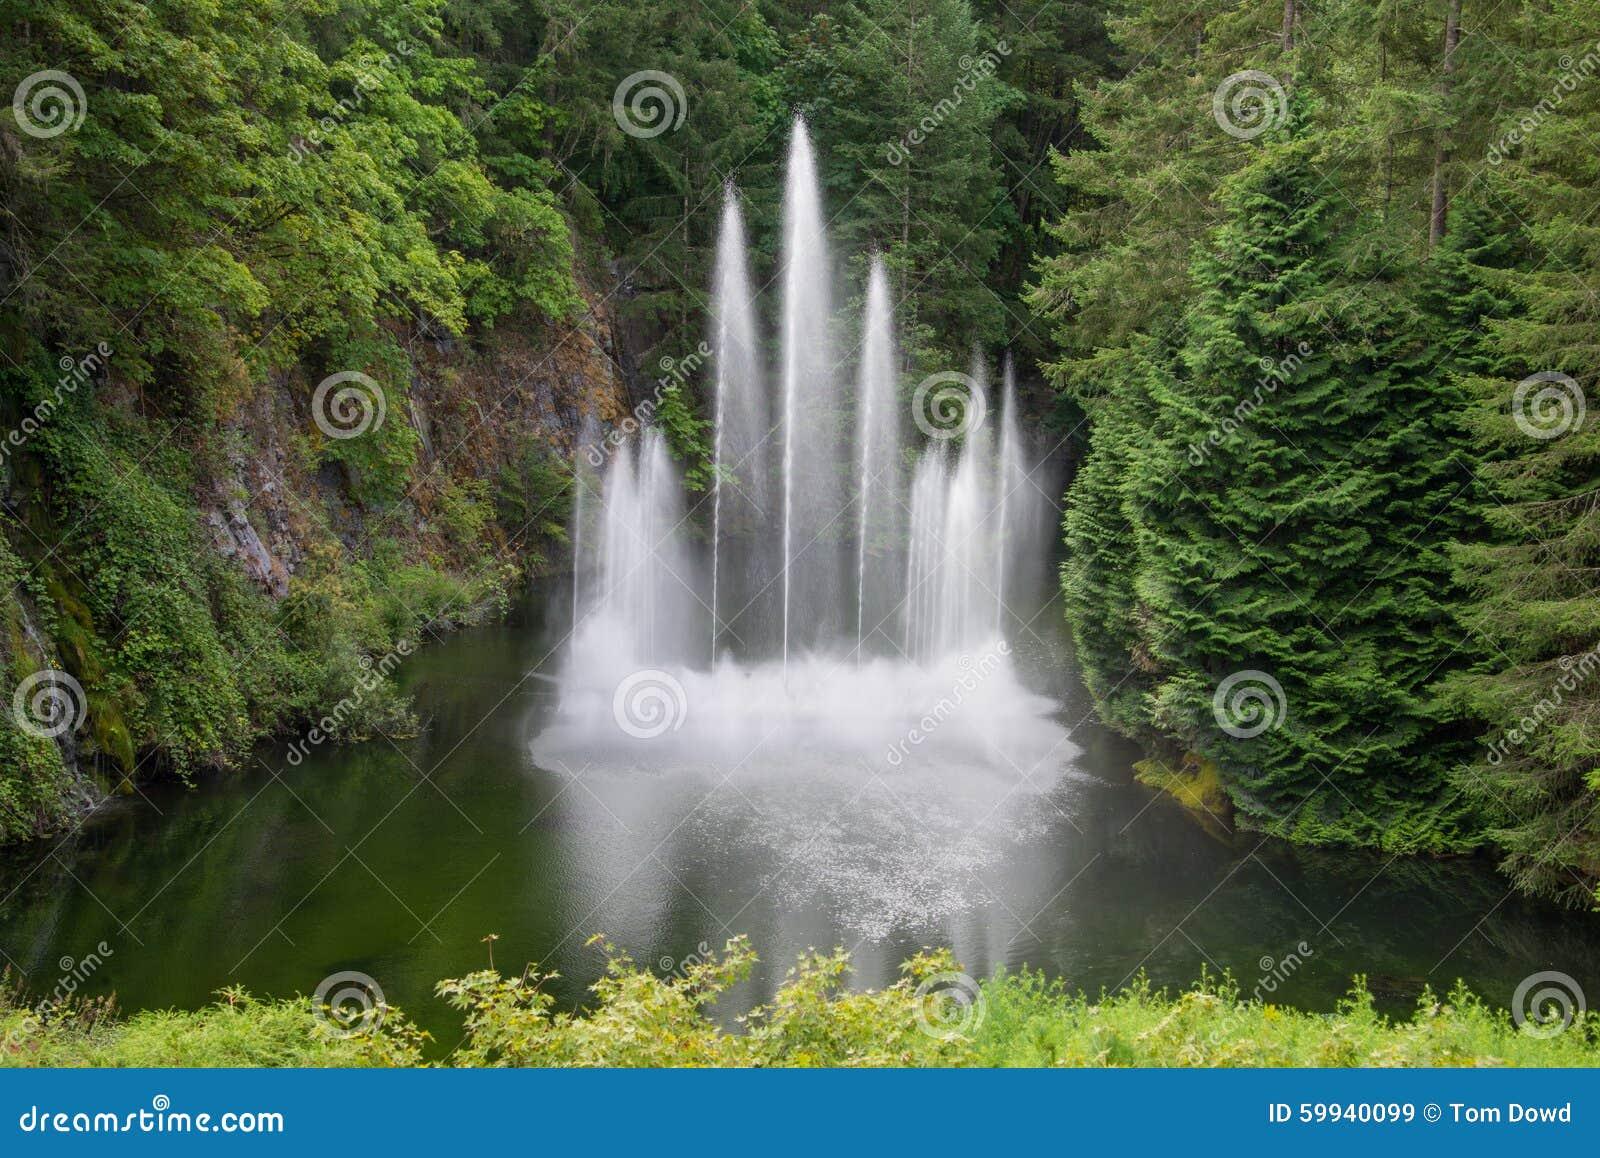 Water fountain in sunken garden butchart gardens - What time does victoria gardens close ...